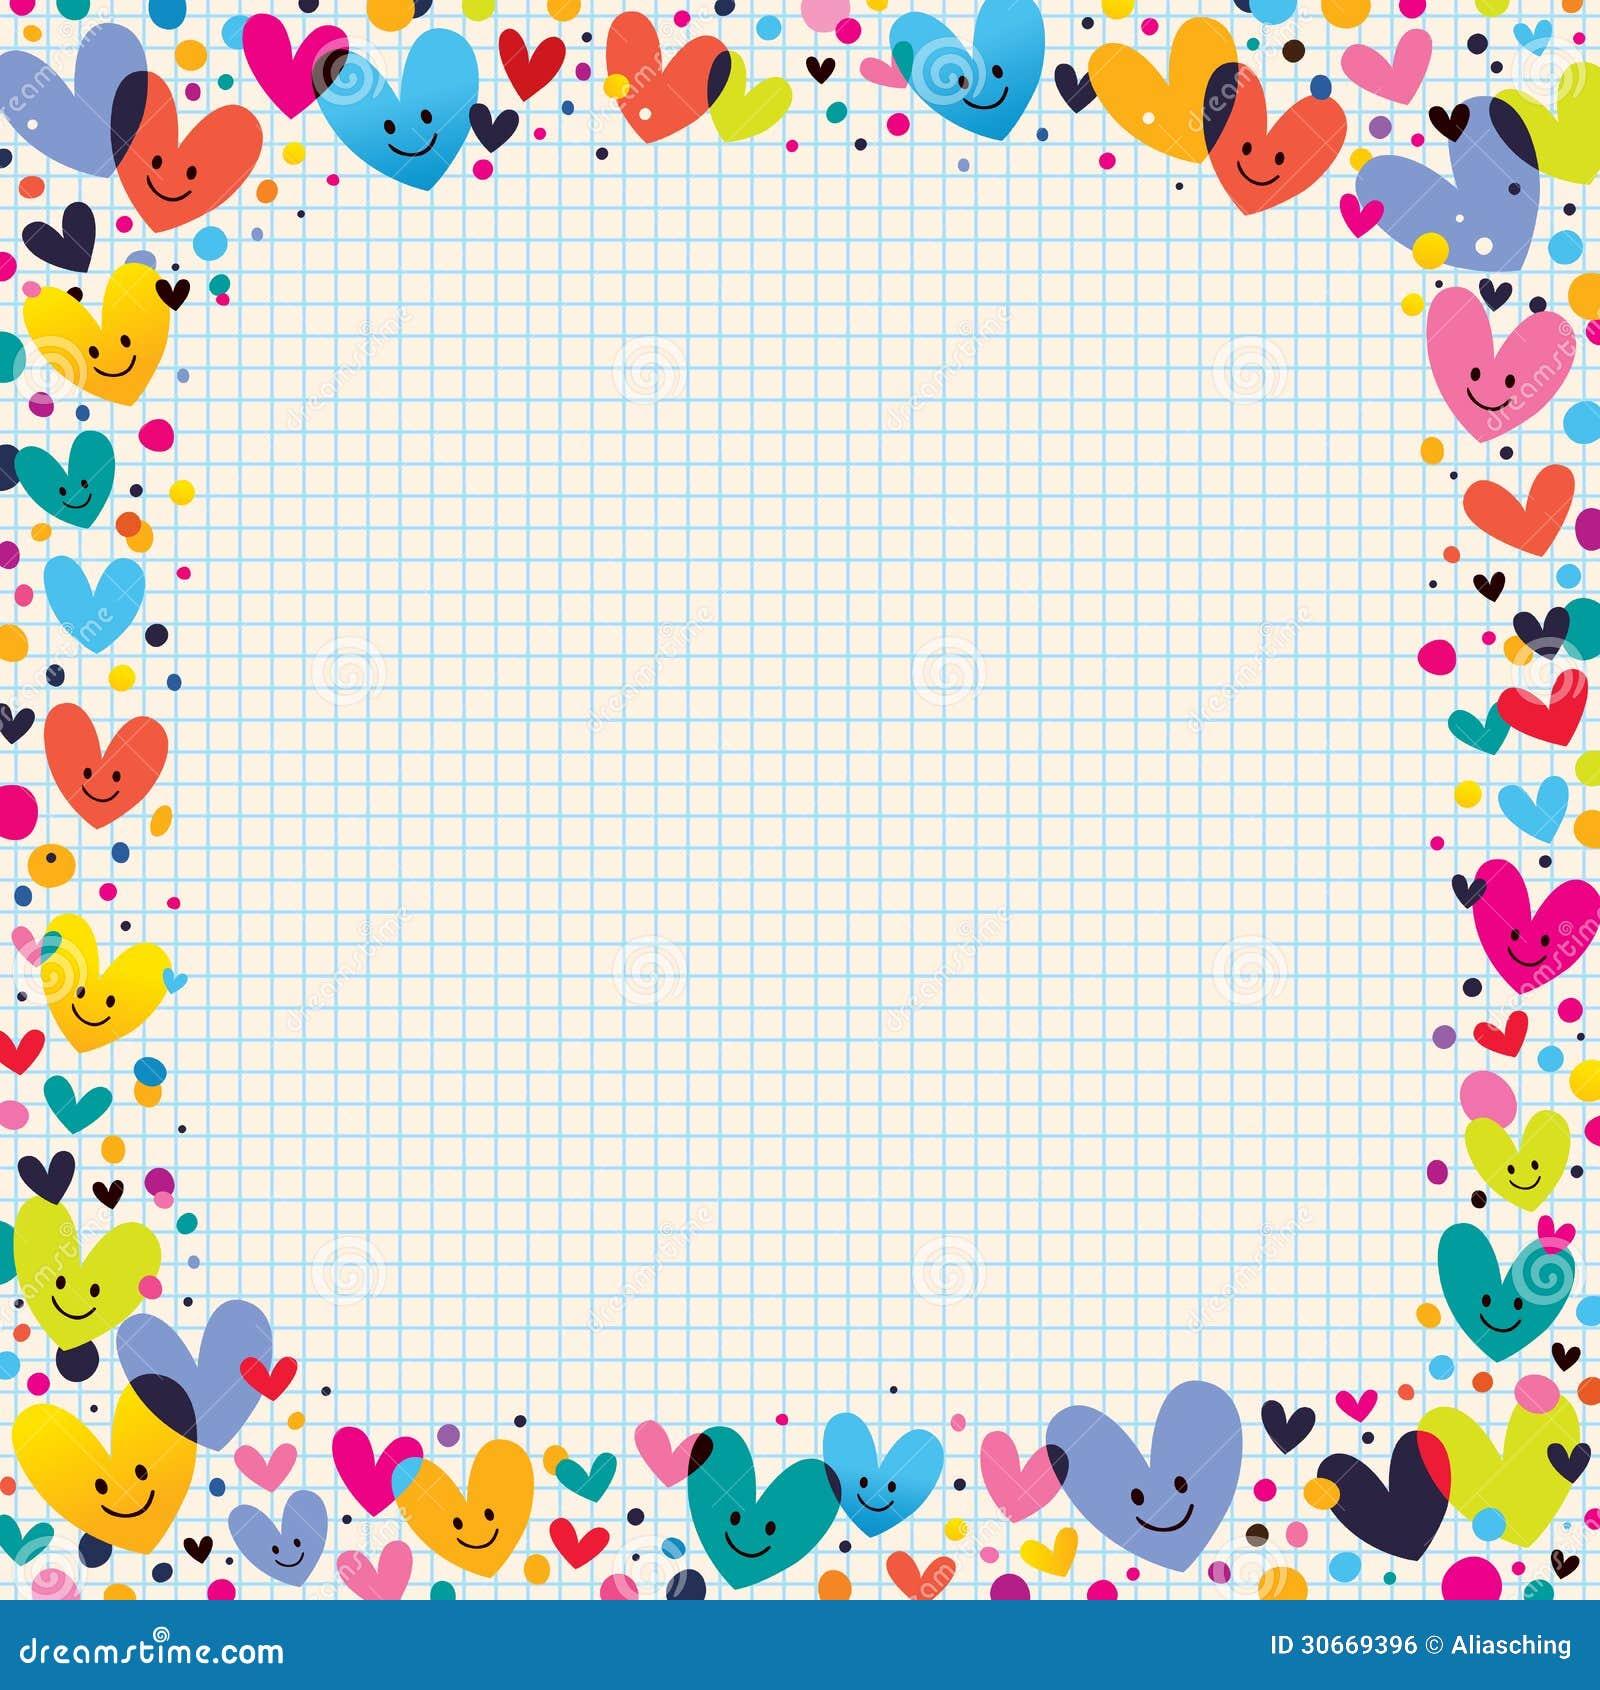 Cute Hearts Border Royalty Free Stock Image Image 30669396